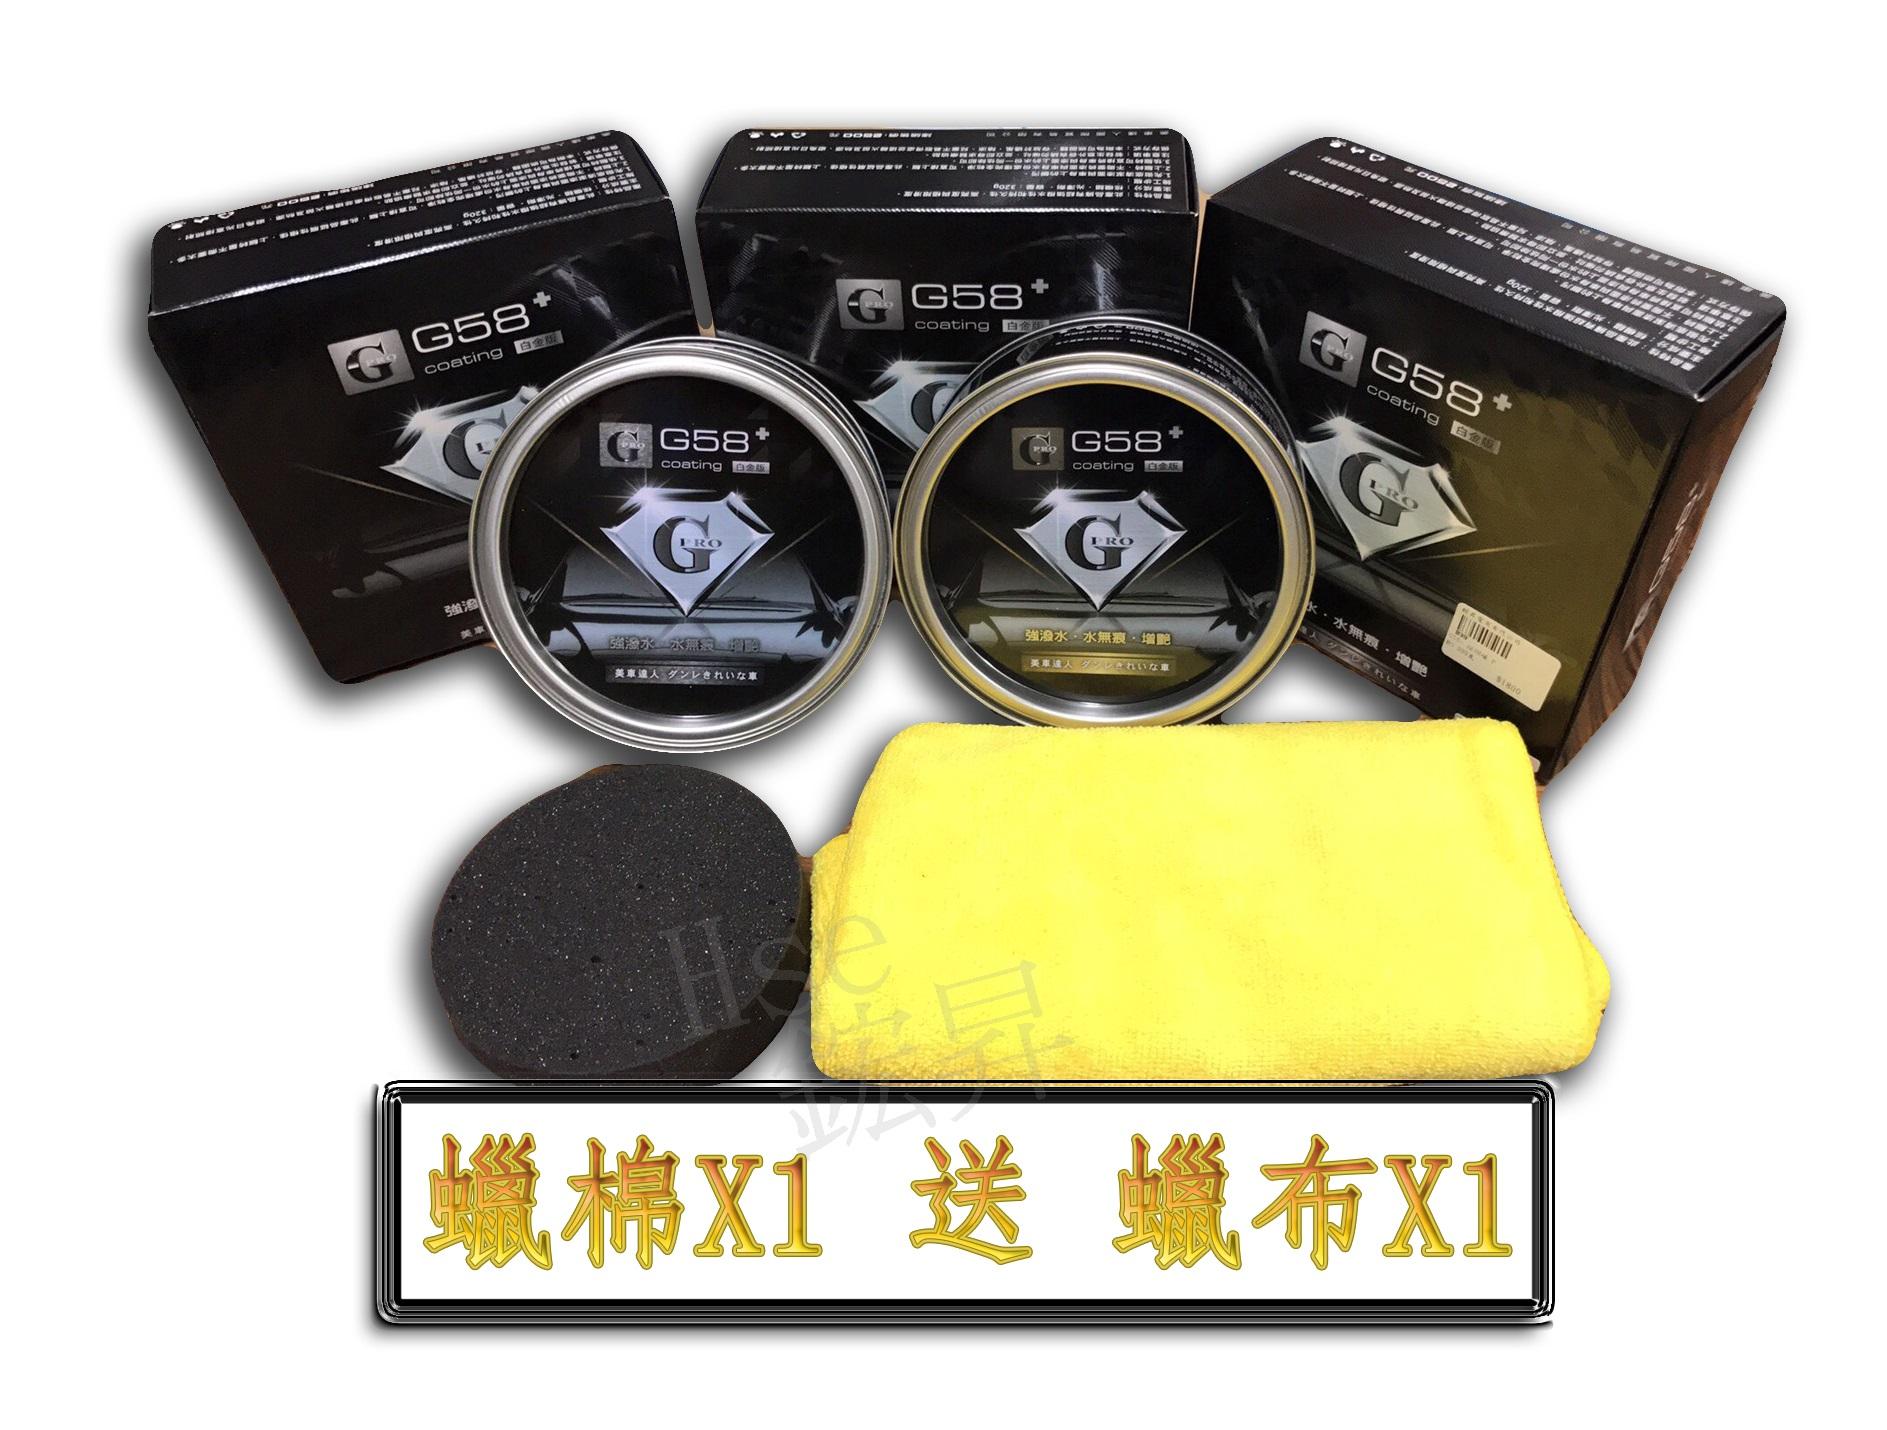 G58+ 棕櫚蠟 PRO公司貨 300克 可參考 G58 柯林 845,鯊魚,Zymol,wolfgang 封體